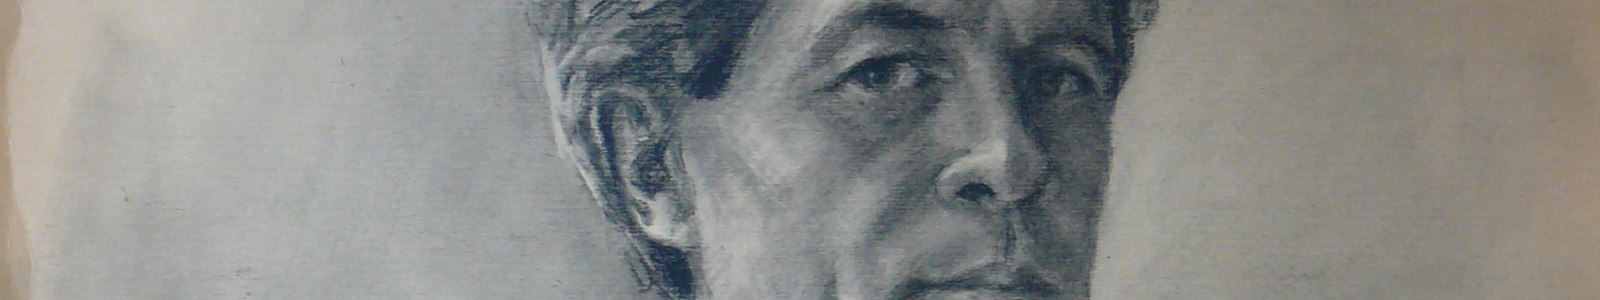 Gallery Painter Mahmut Zaripov